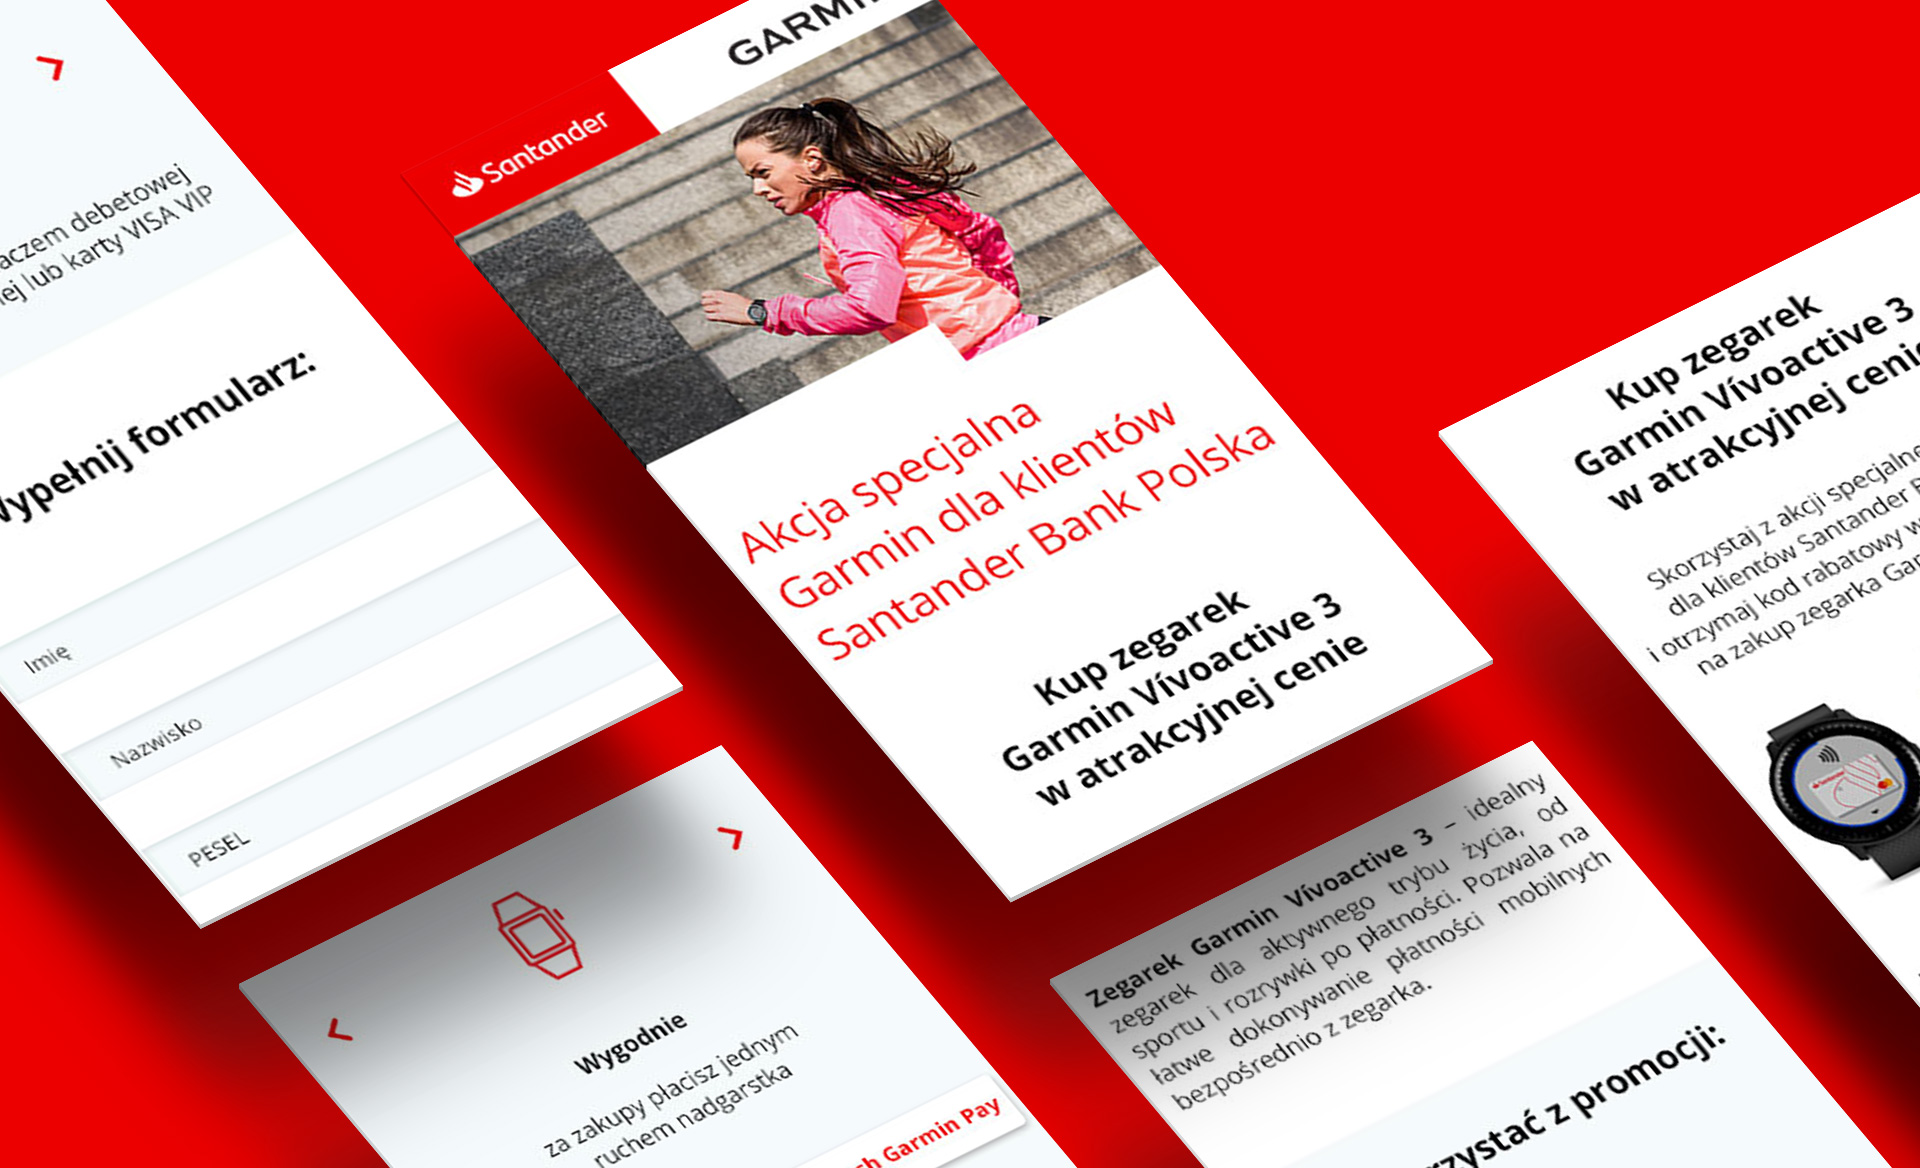 Santander and Garmin